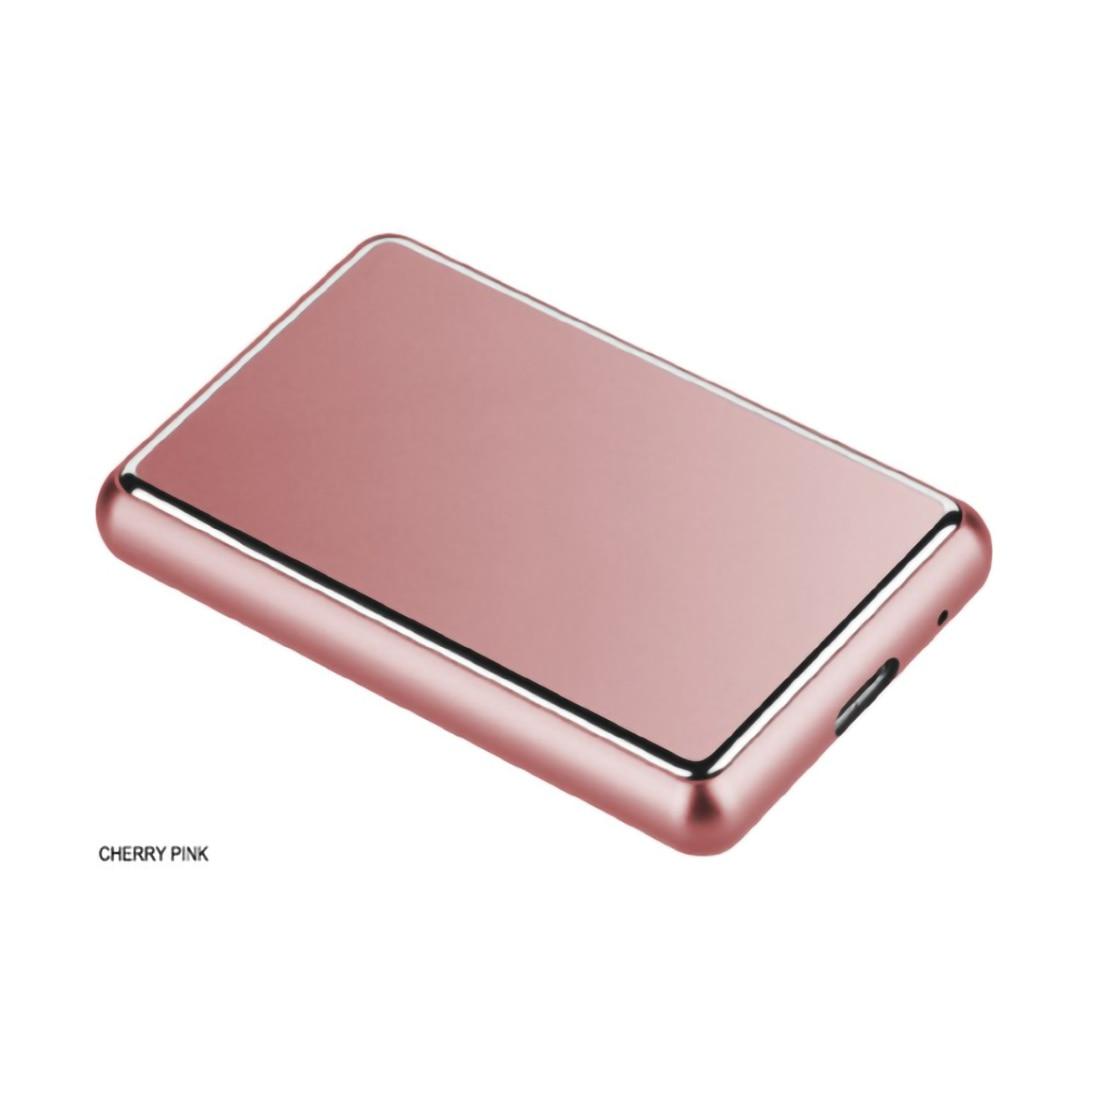 Mini carcasa de SSD tipo C mSATA, carcasa de disco duro de alta velocidad, USB3.1, 6Gbps, USB C, clave M, 1TB, compatible con Windows/Linux/Mac